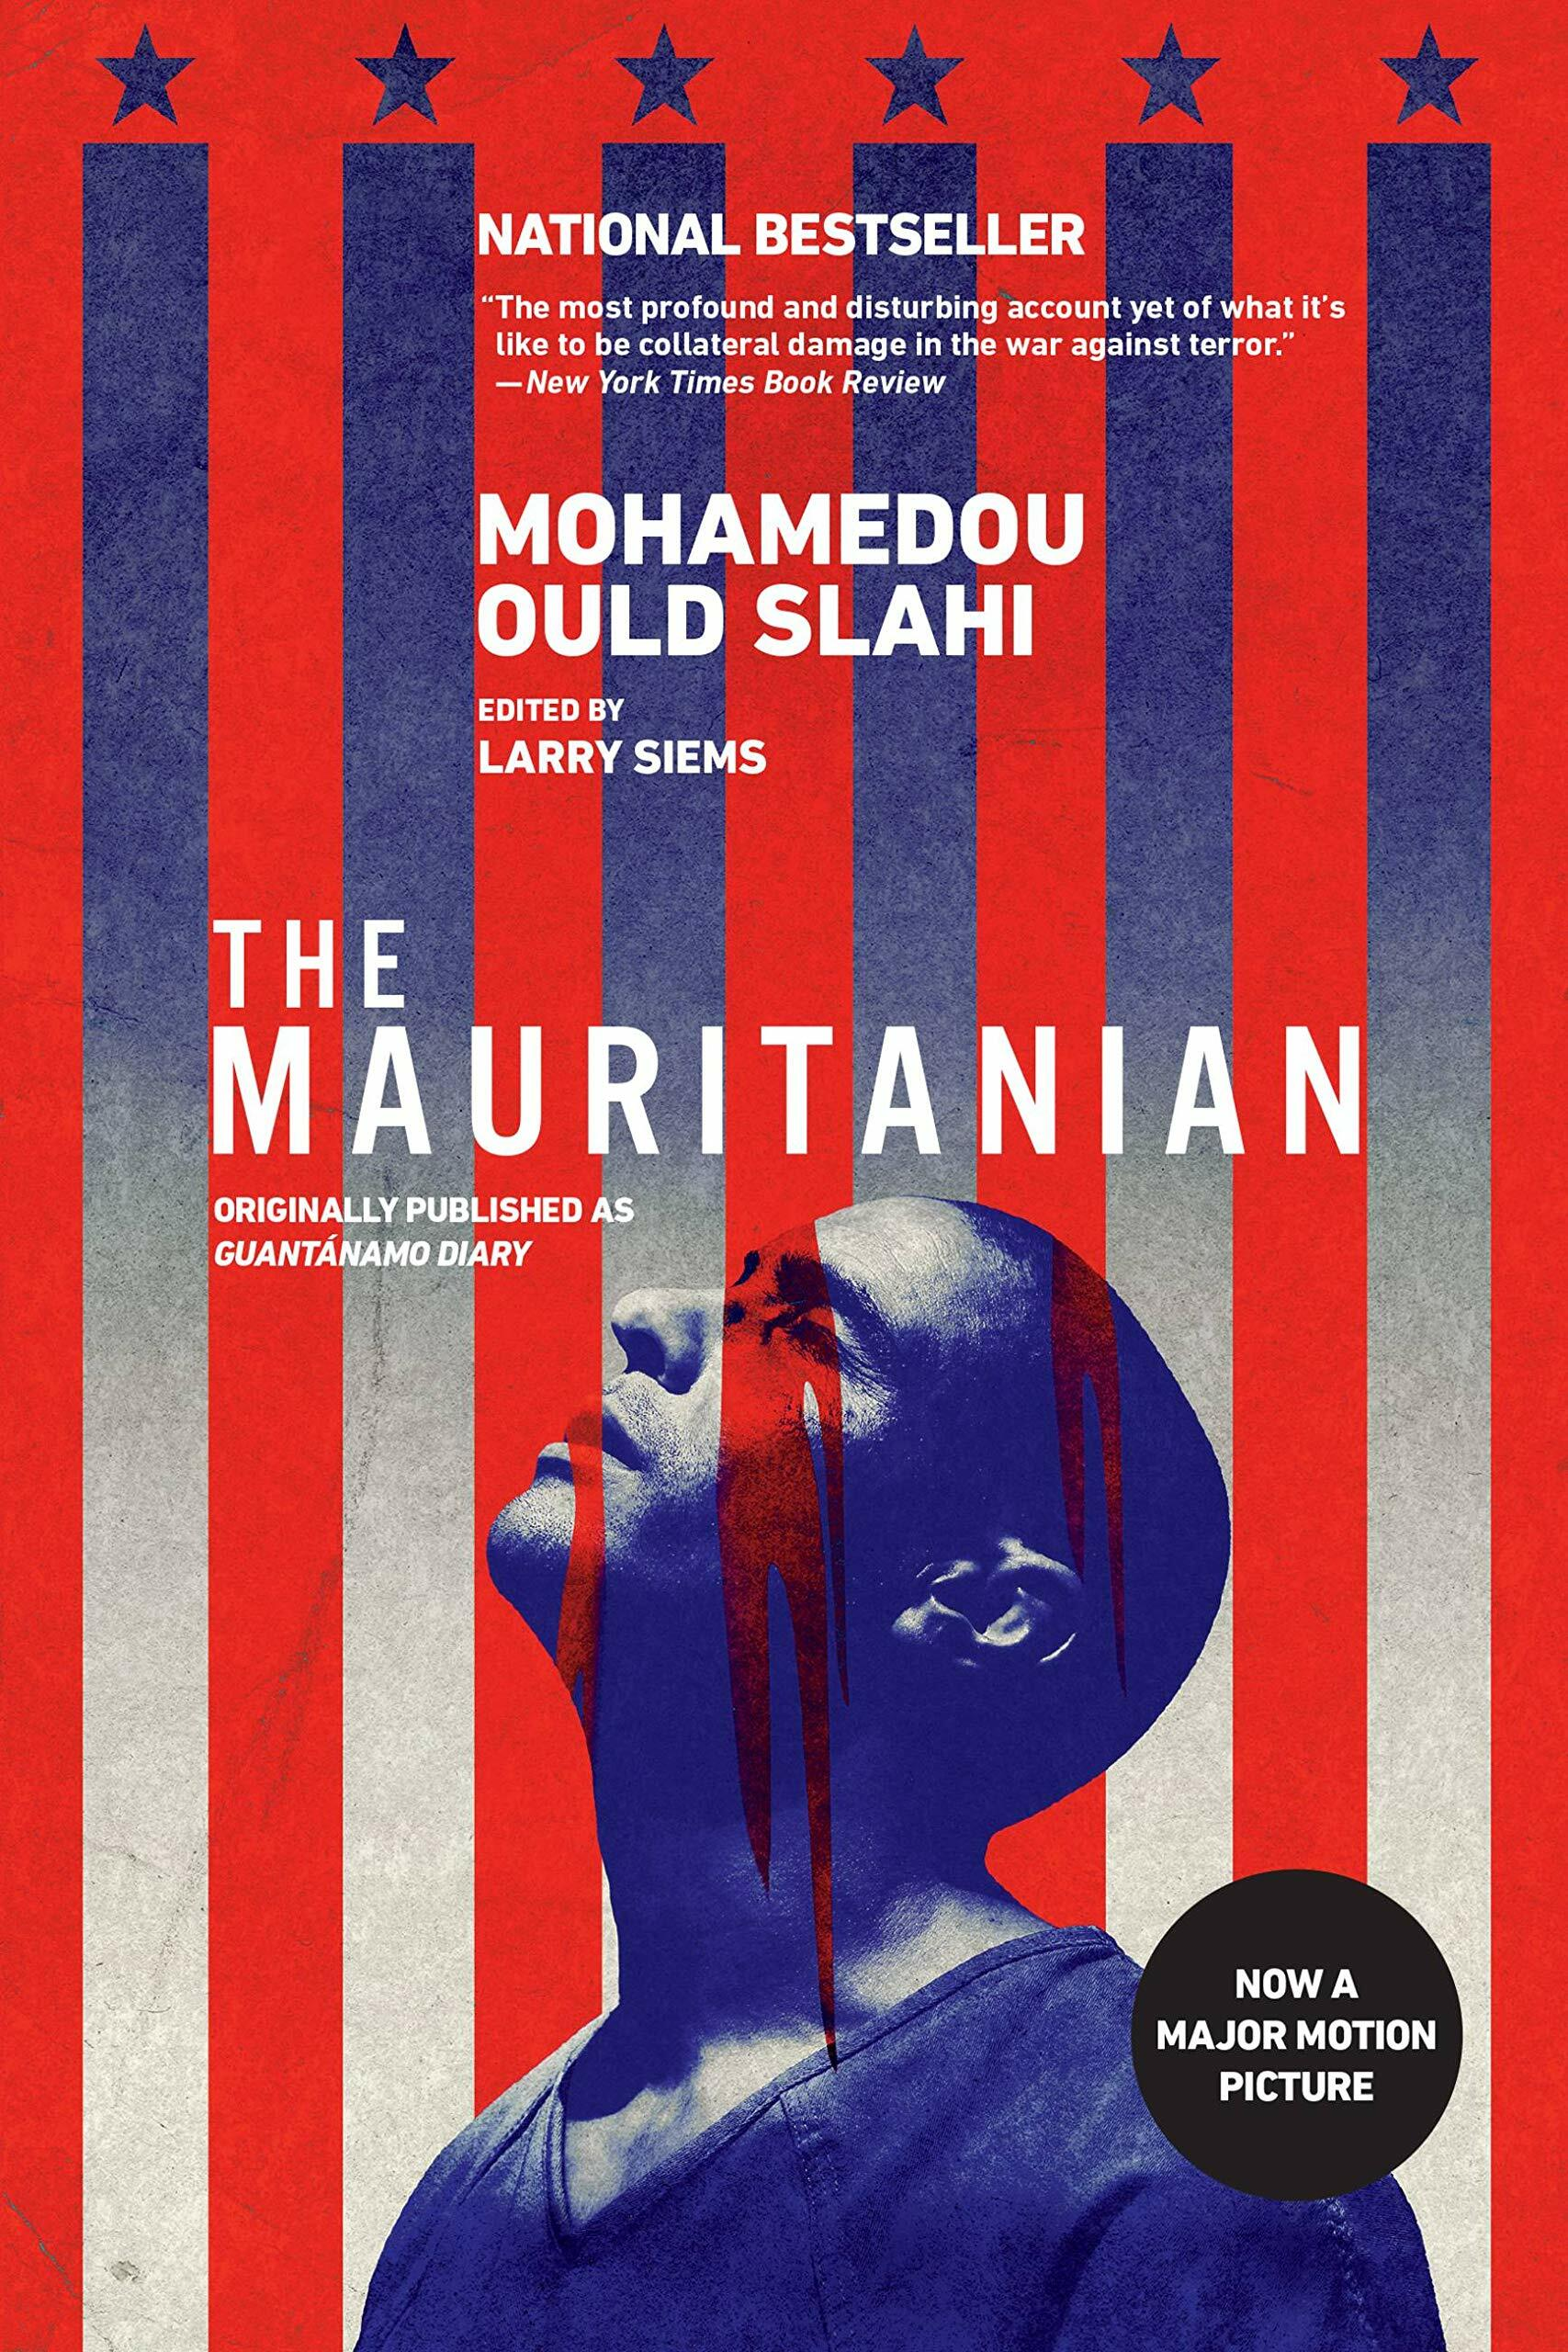 The Mauritanian (Paperback, Tie-In - Film tie-in)